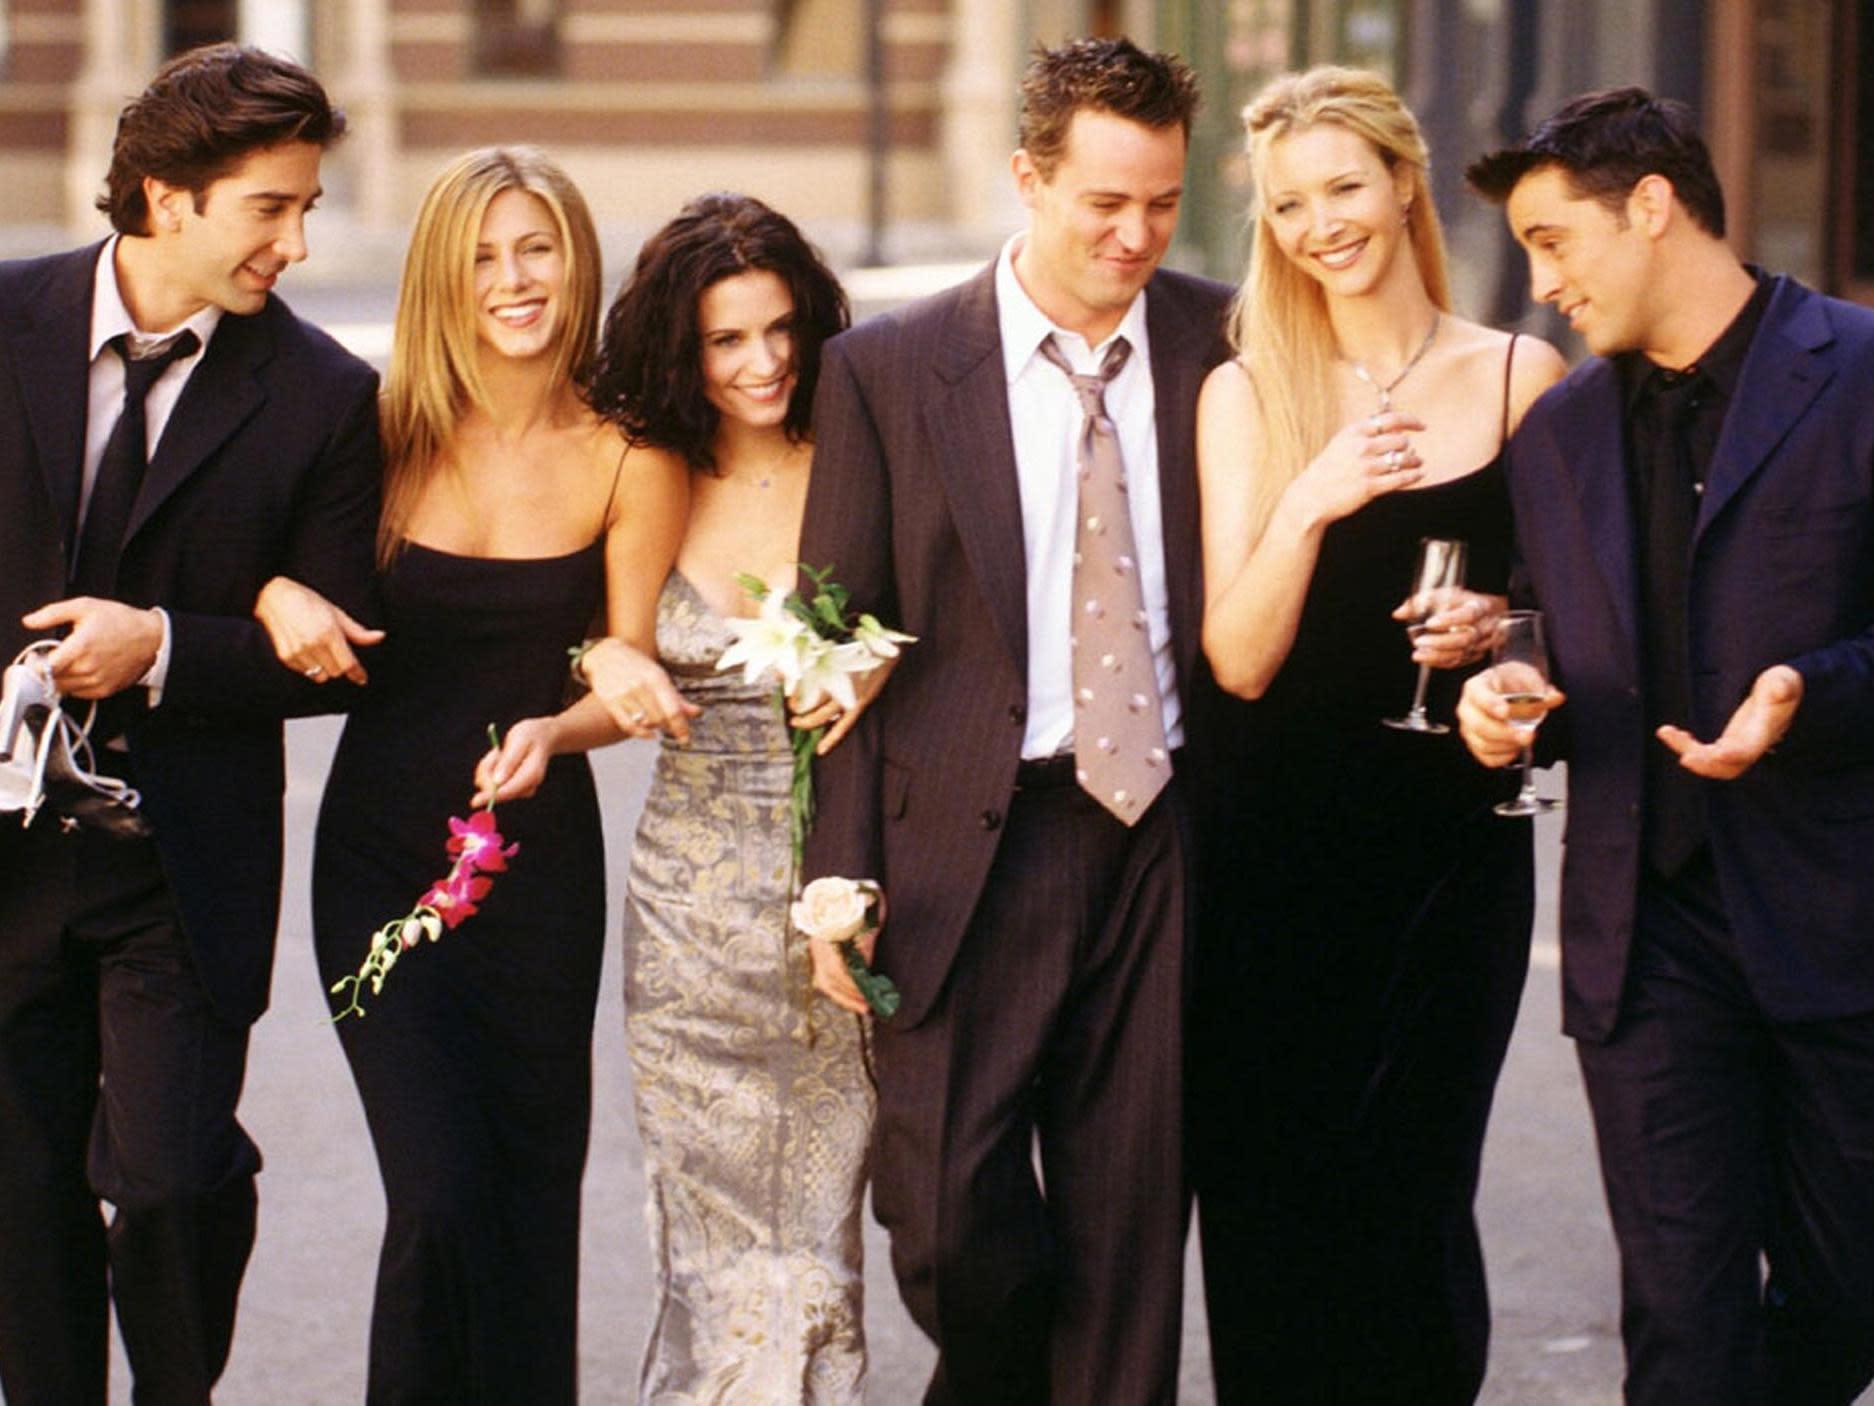 Are Friends reruns really worth $100 million?